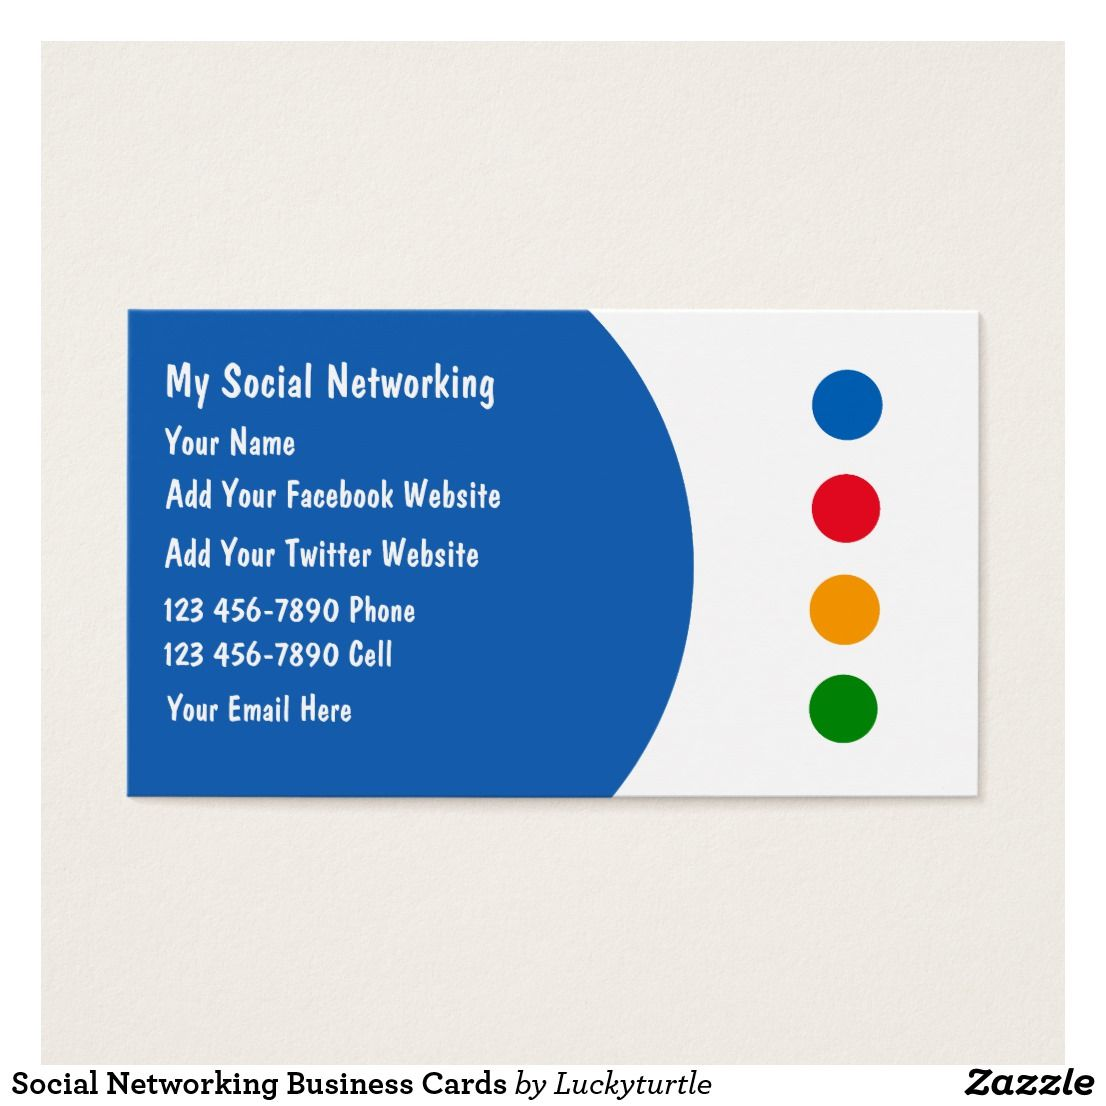 Social Networking Business Cards Zazzle Com Business Cards Social Networks Cards